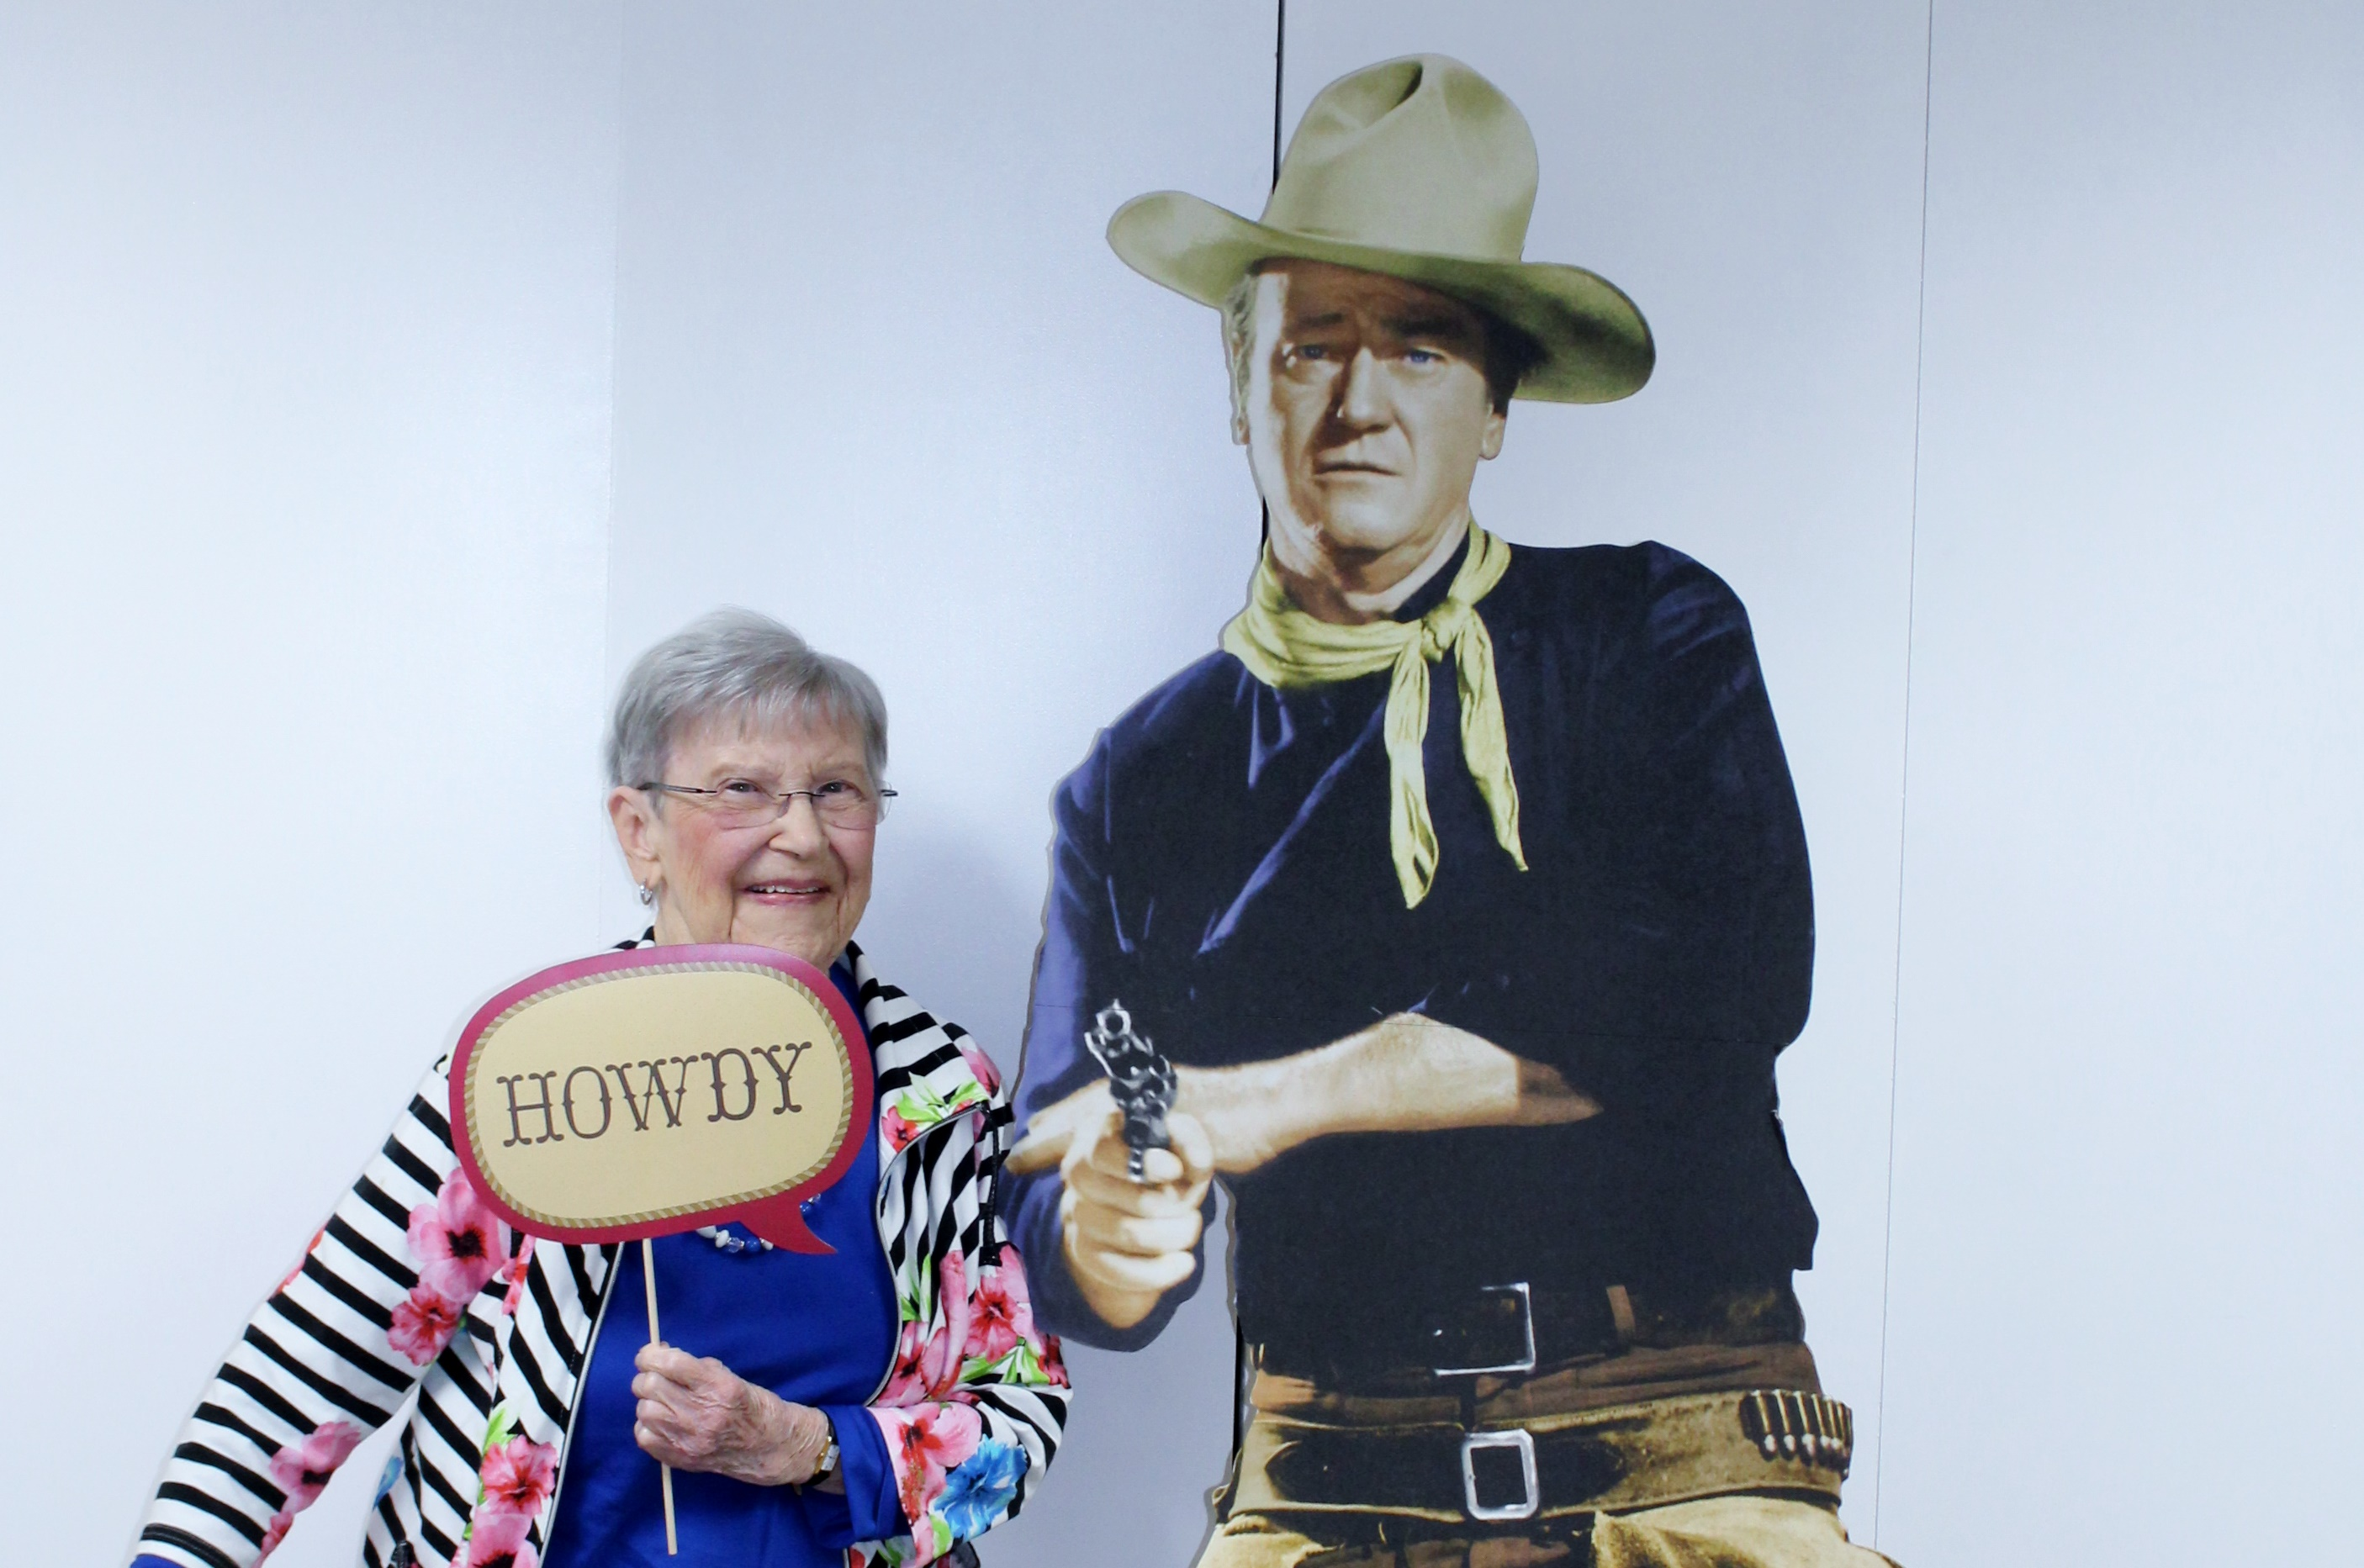 Howdy yourself, dear Rita!